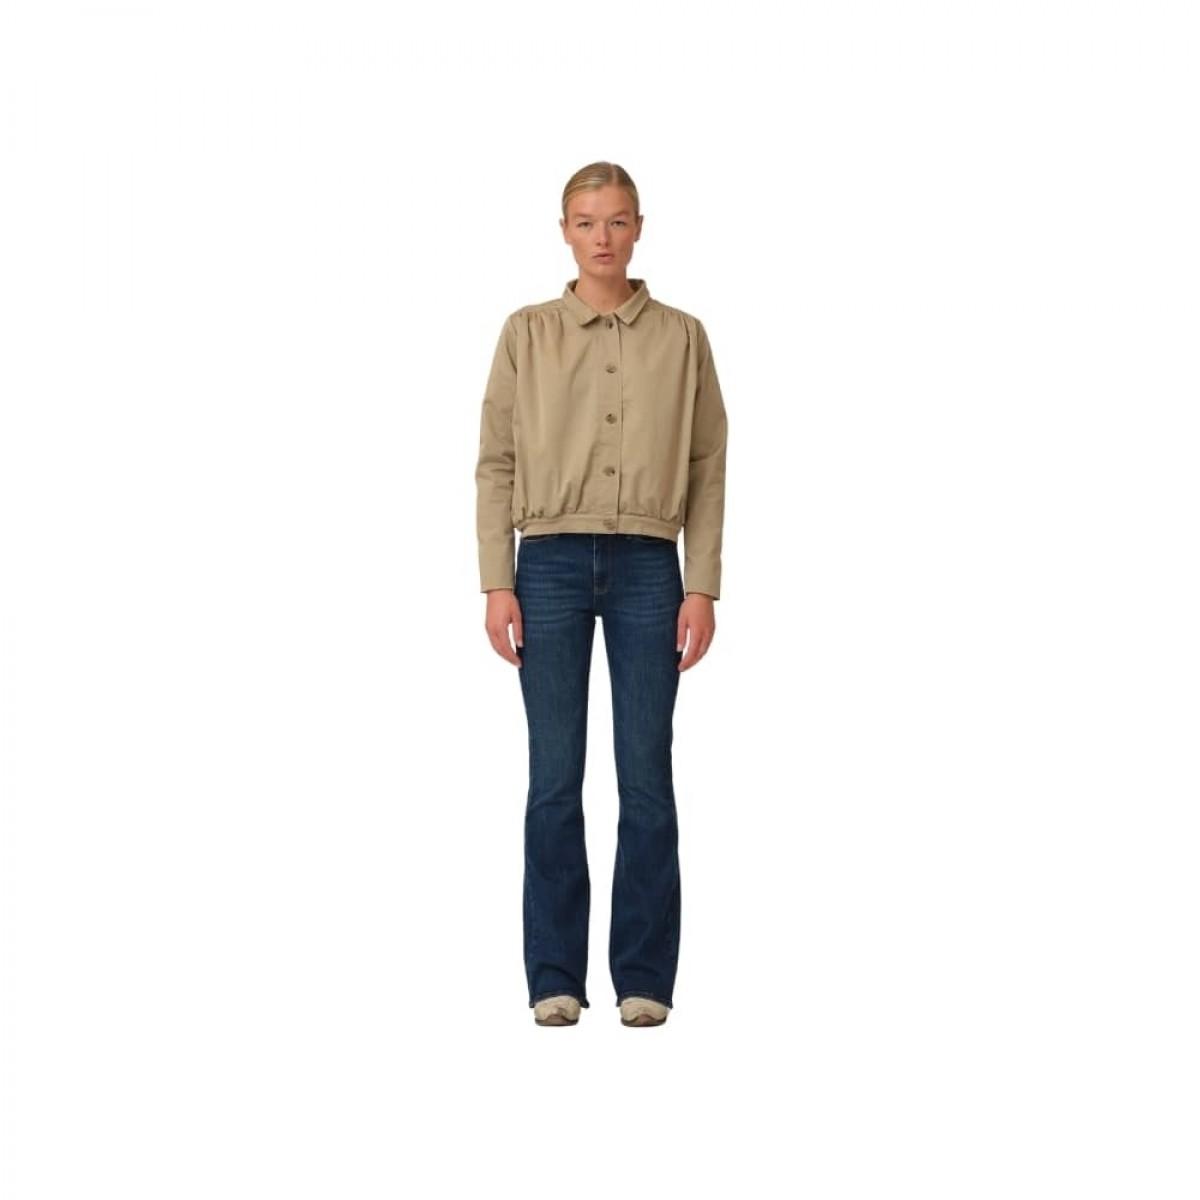 greta cropped jacket - camel - model front